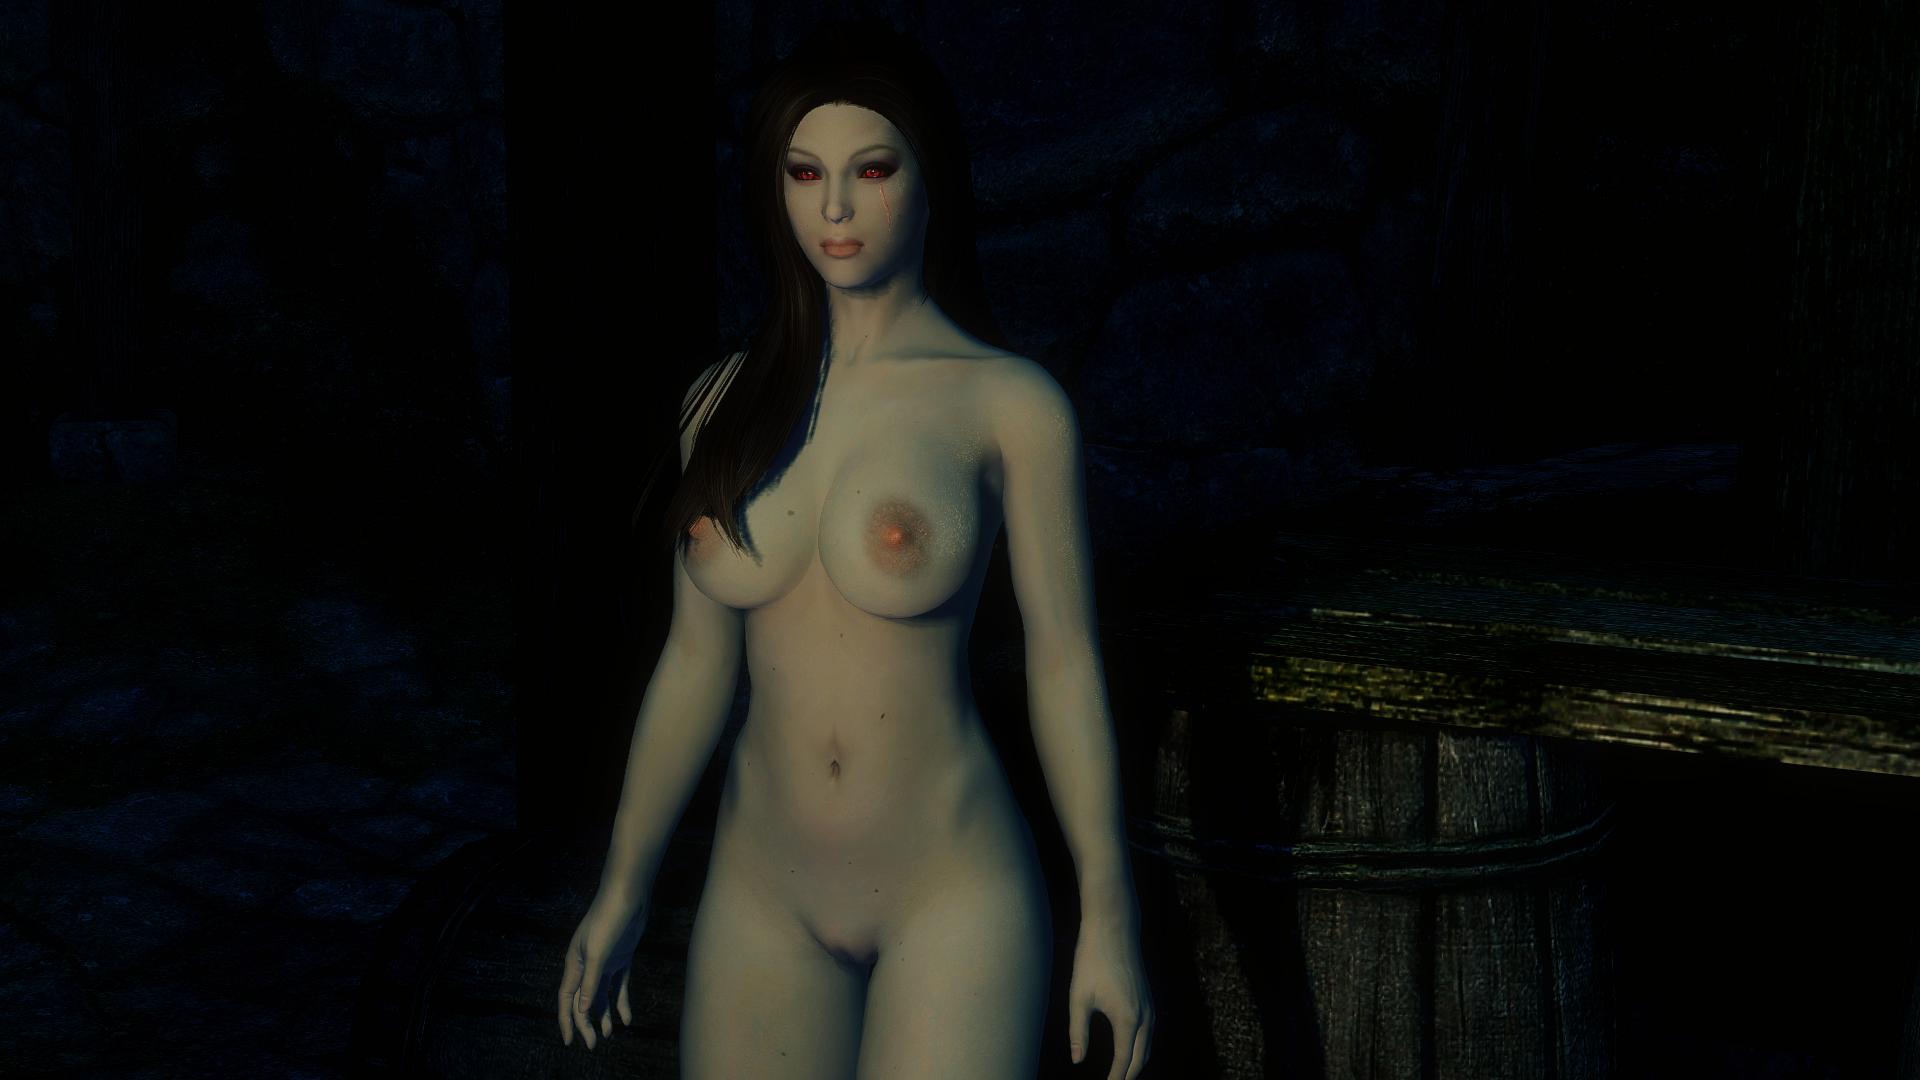 skyrim_sse_yg_dark_elf_dusk_5_by_silvist